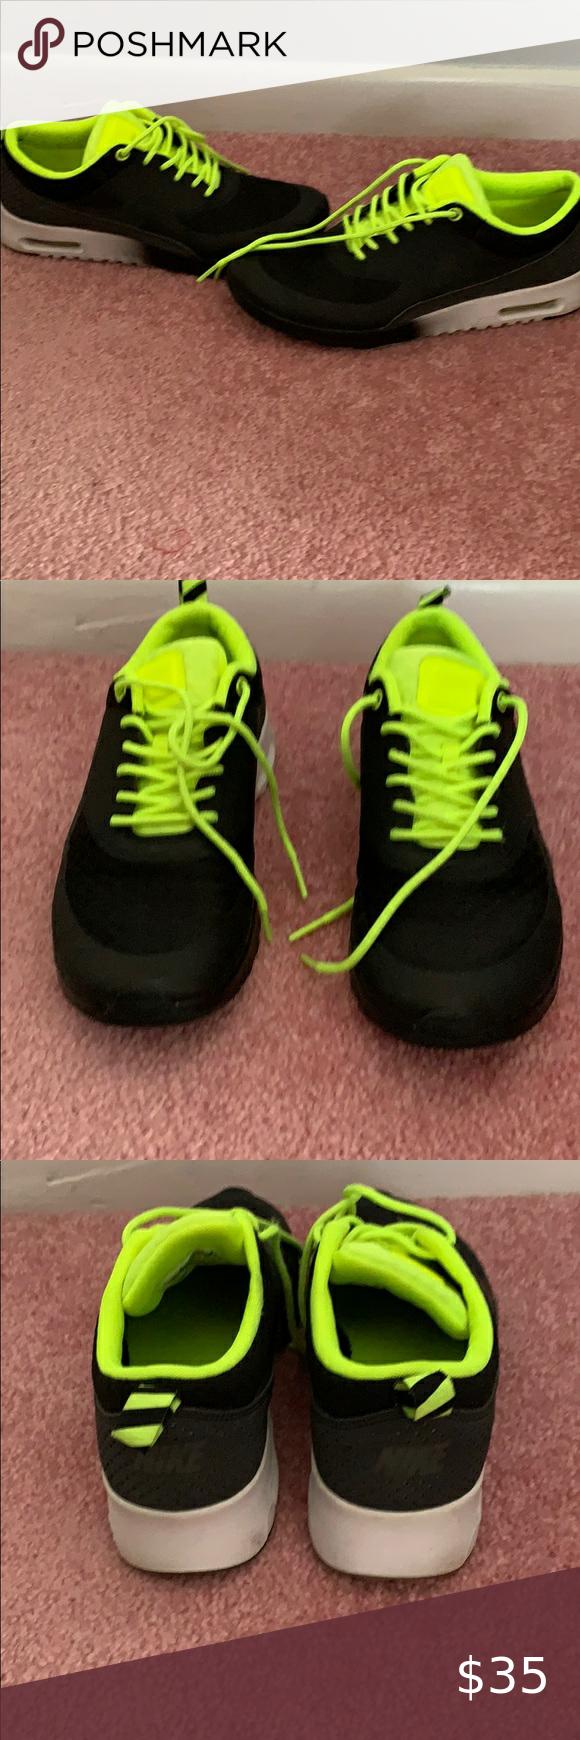 Nike flex run, Green sneakers, Nike flex